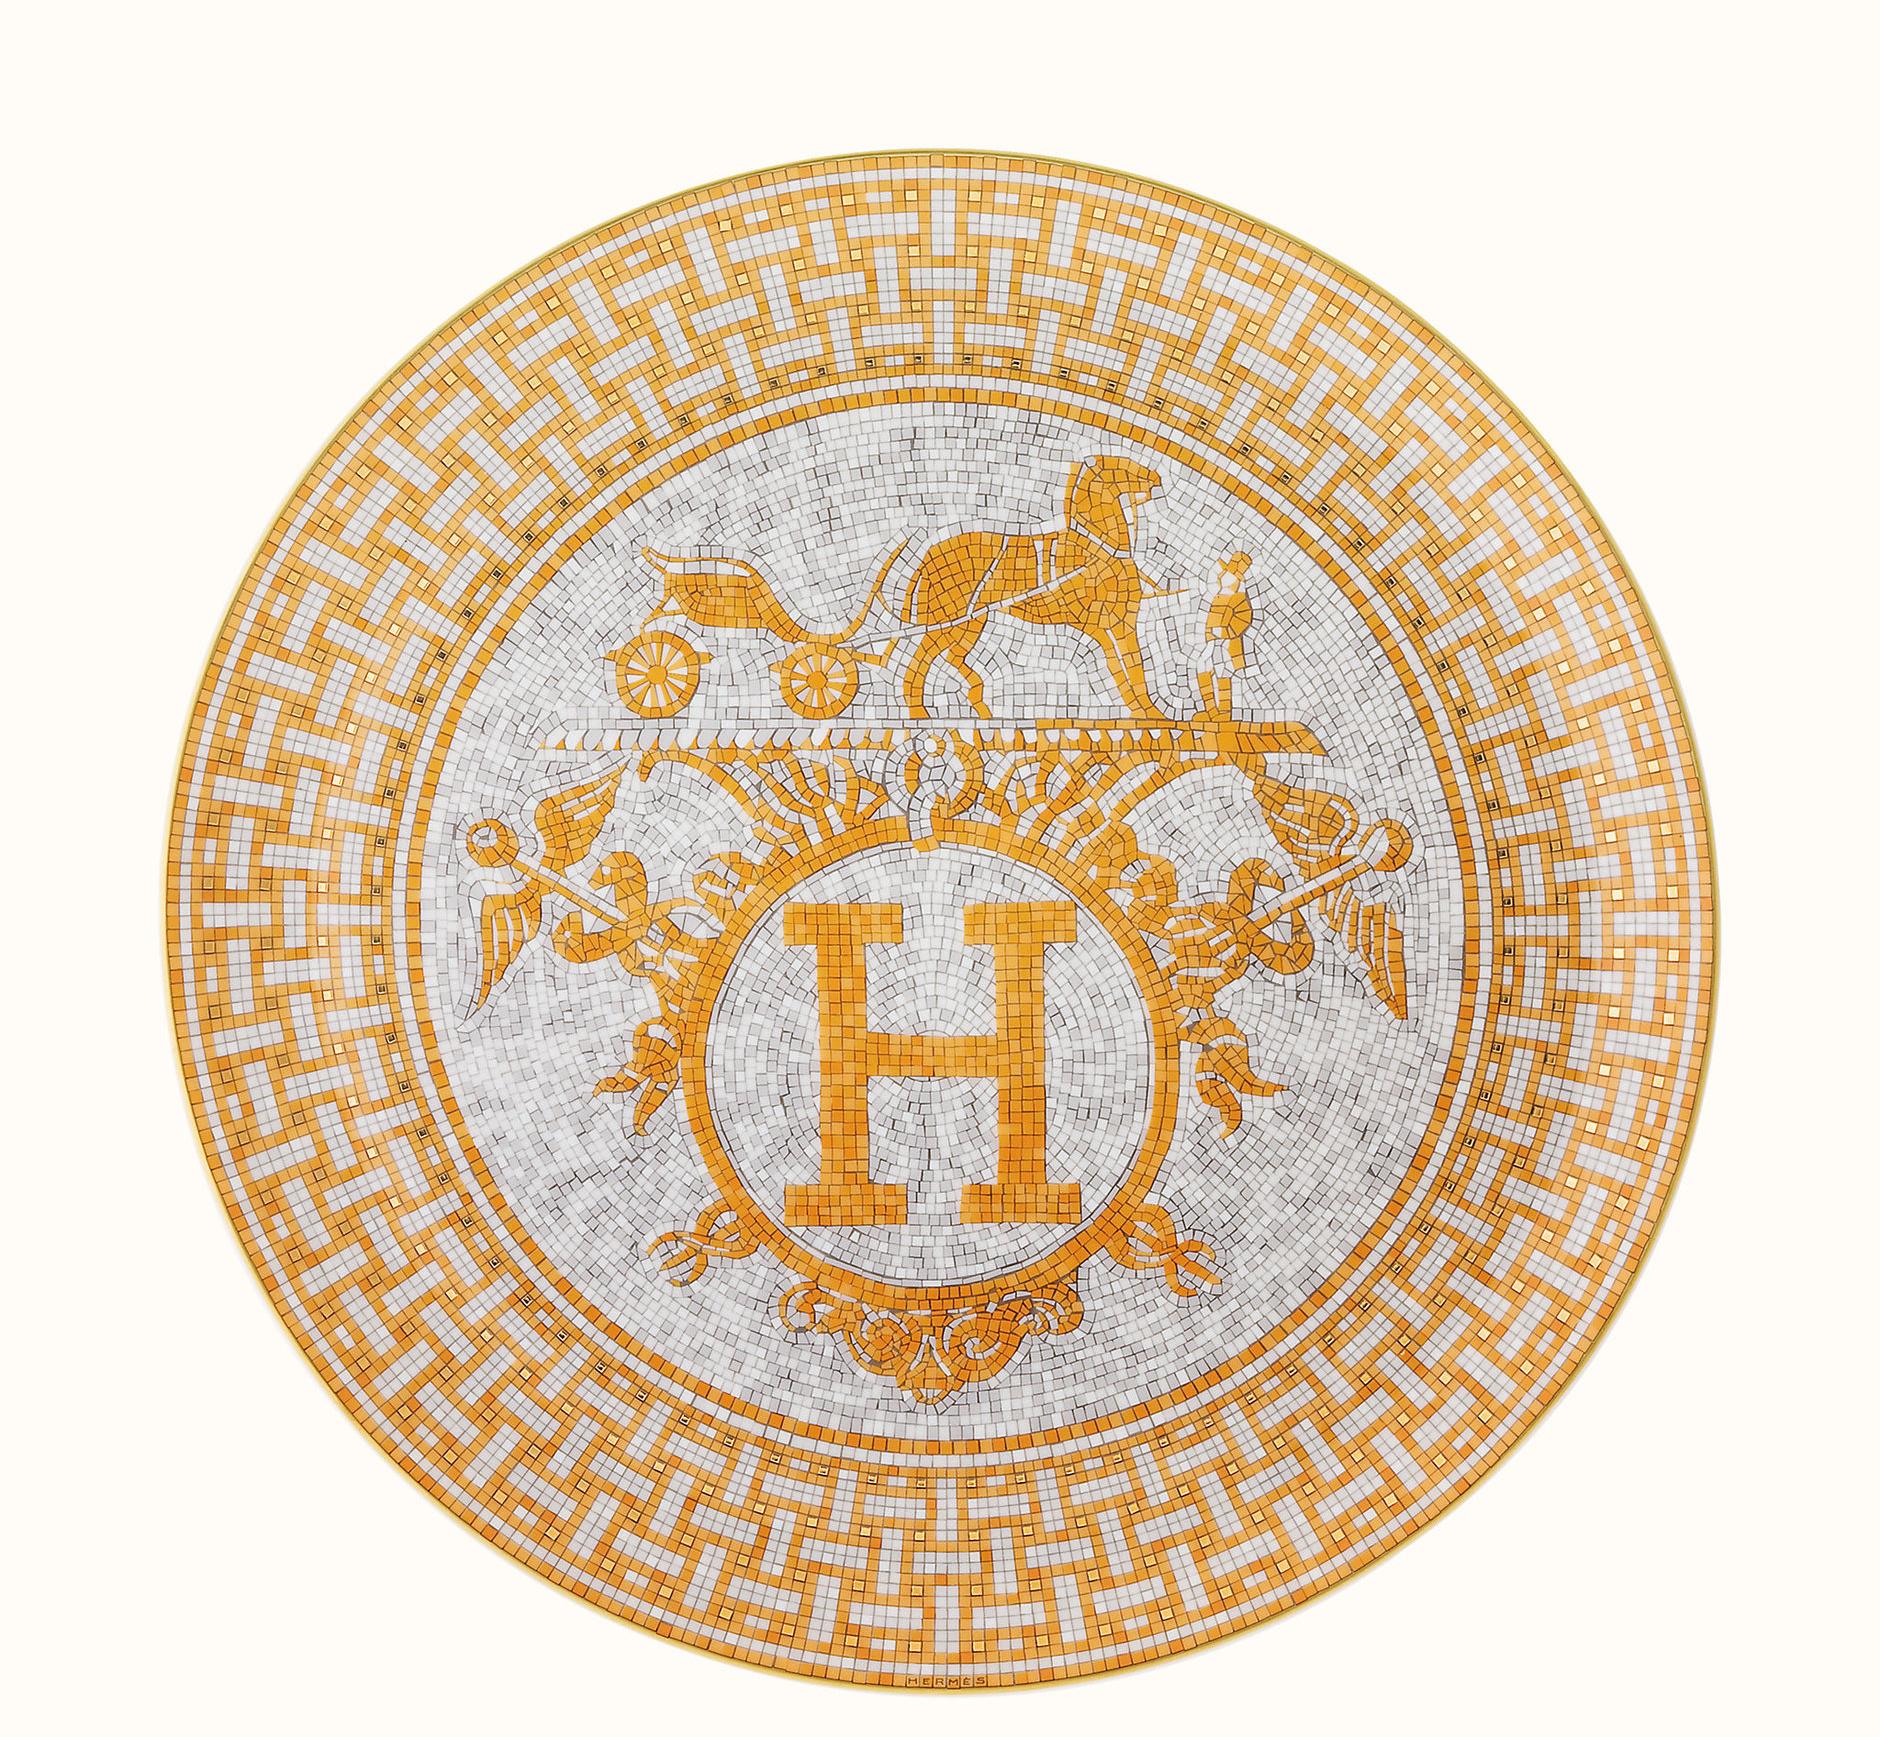 Золотая лихорадка: техника и декор в цвете золота (галерея 2, фото 4)